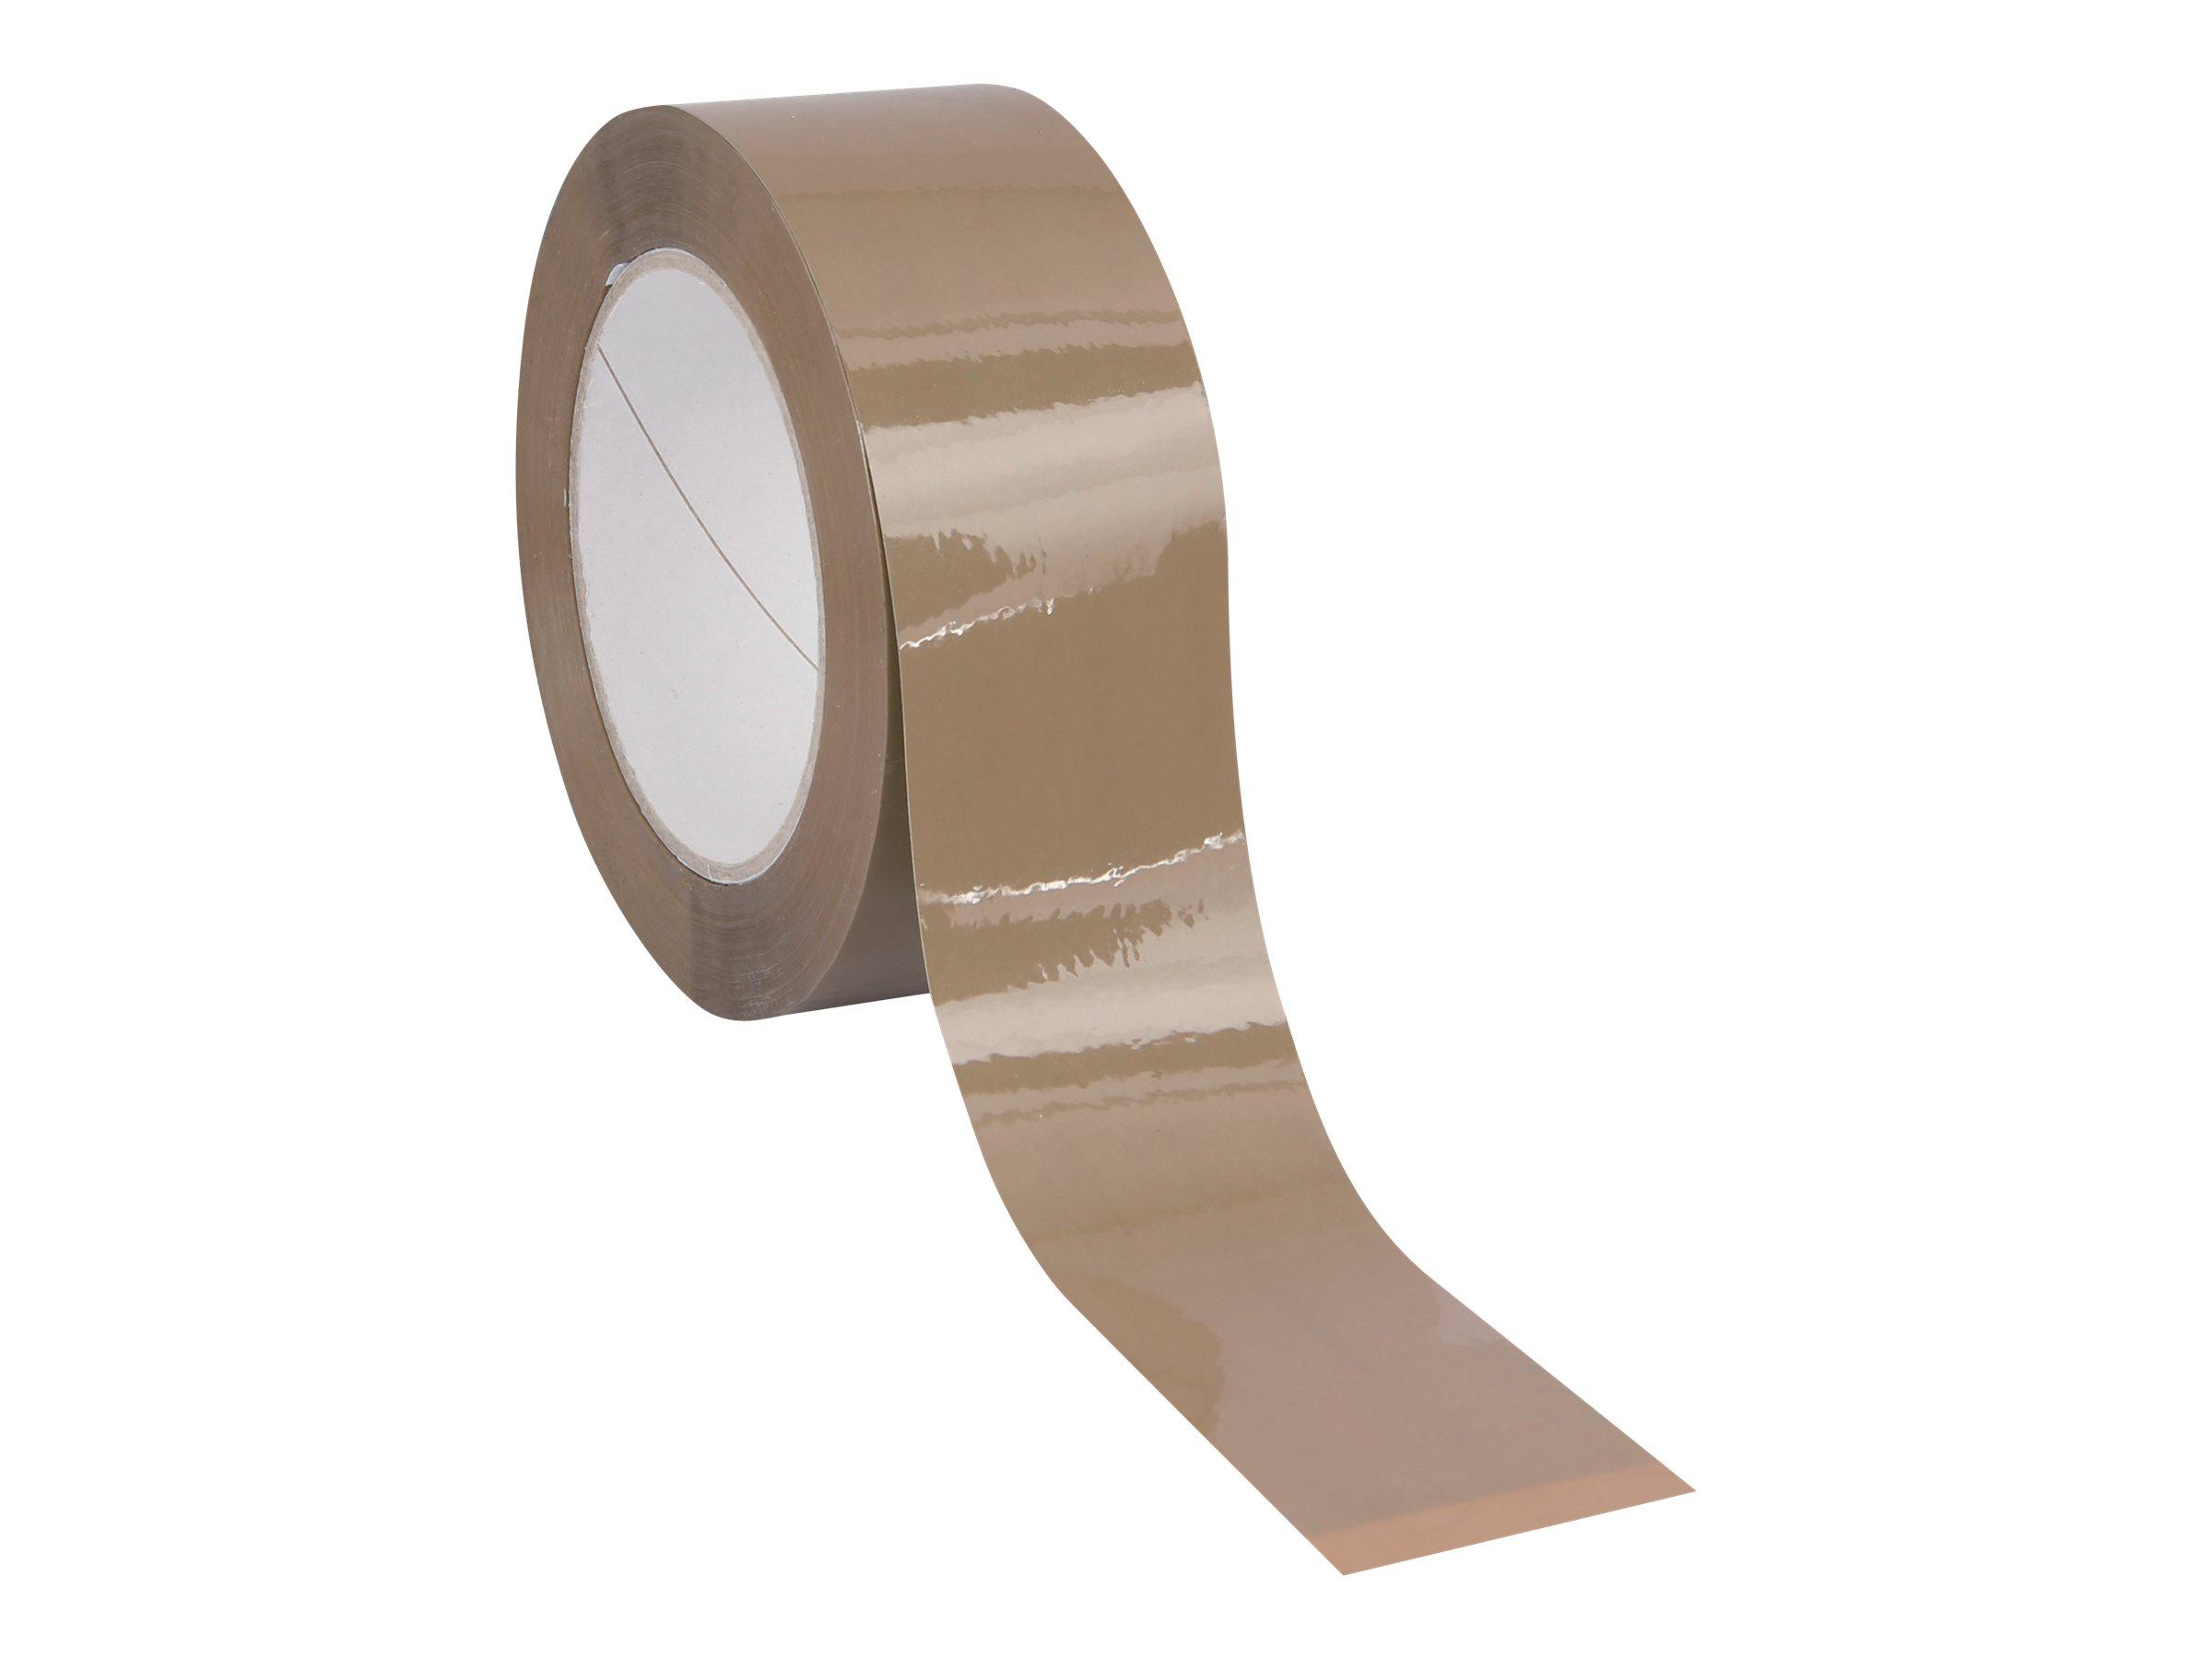 Carton Plus - Ruban adhésif d'emballage - 48 mm x 100 m - havane